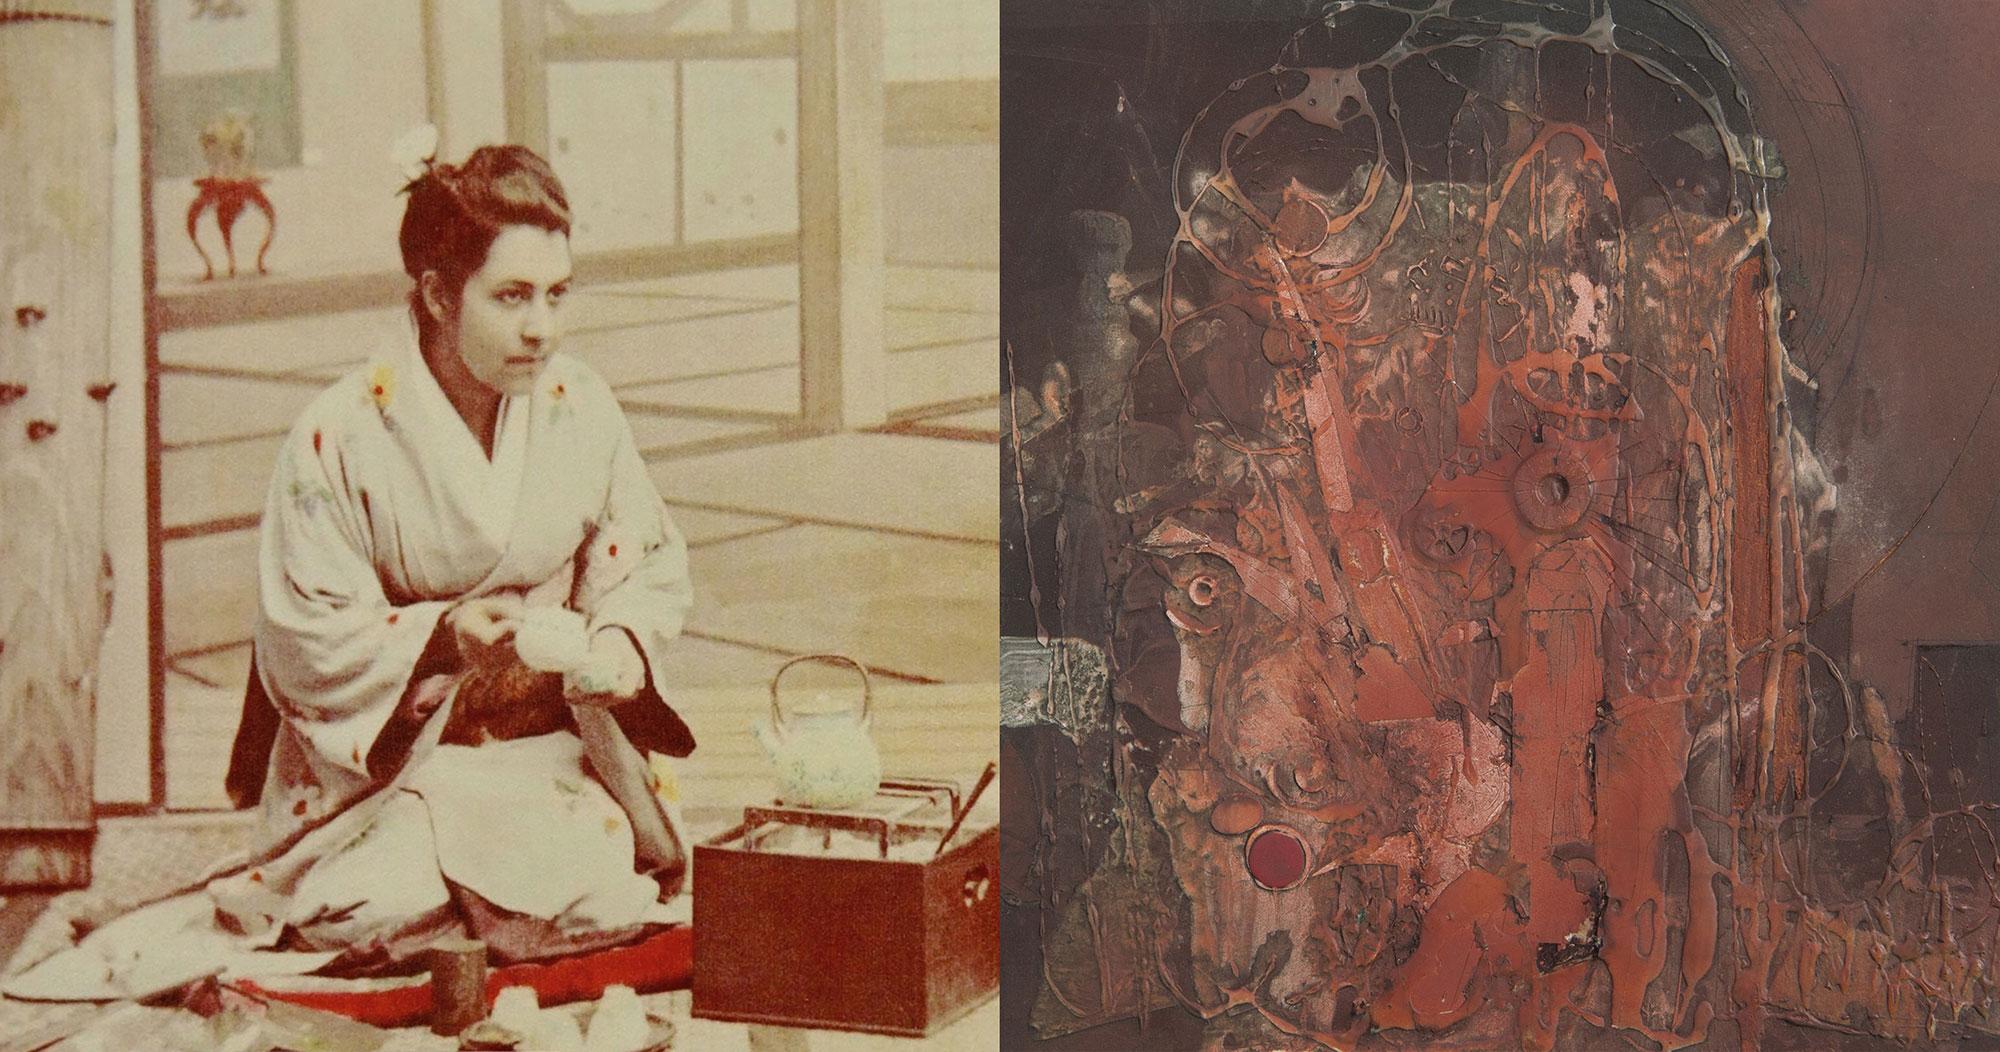 Diana Apcar in Japan in 1890. Berj Kailian, Untitled, mixed media on board, about 1970